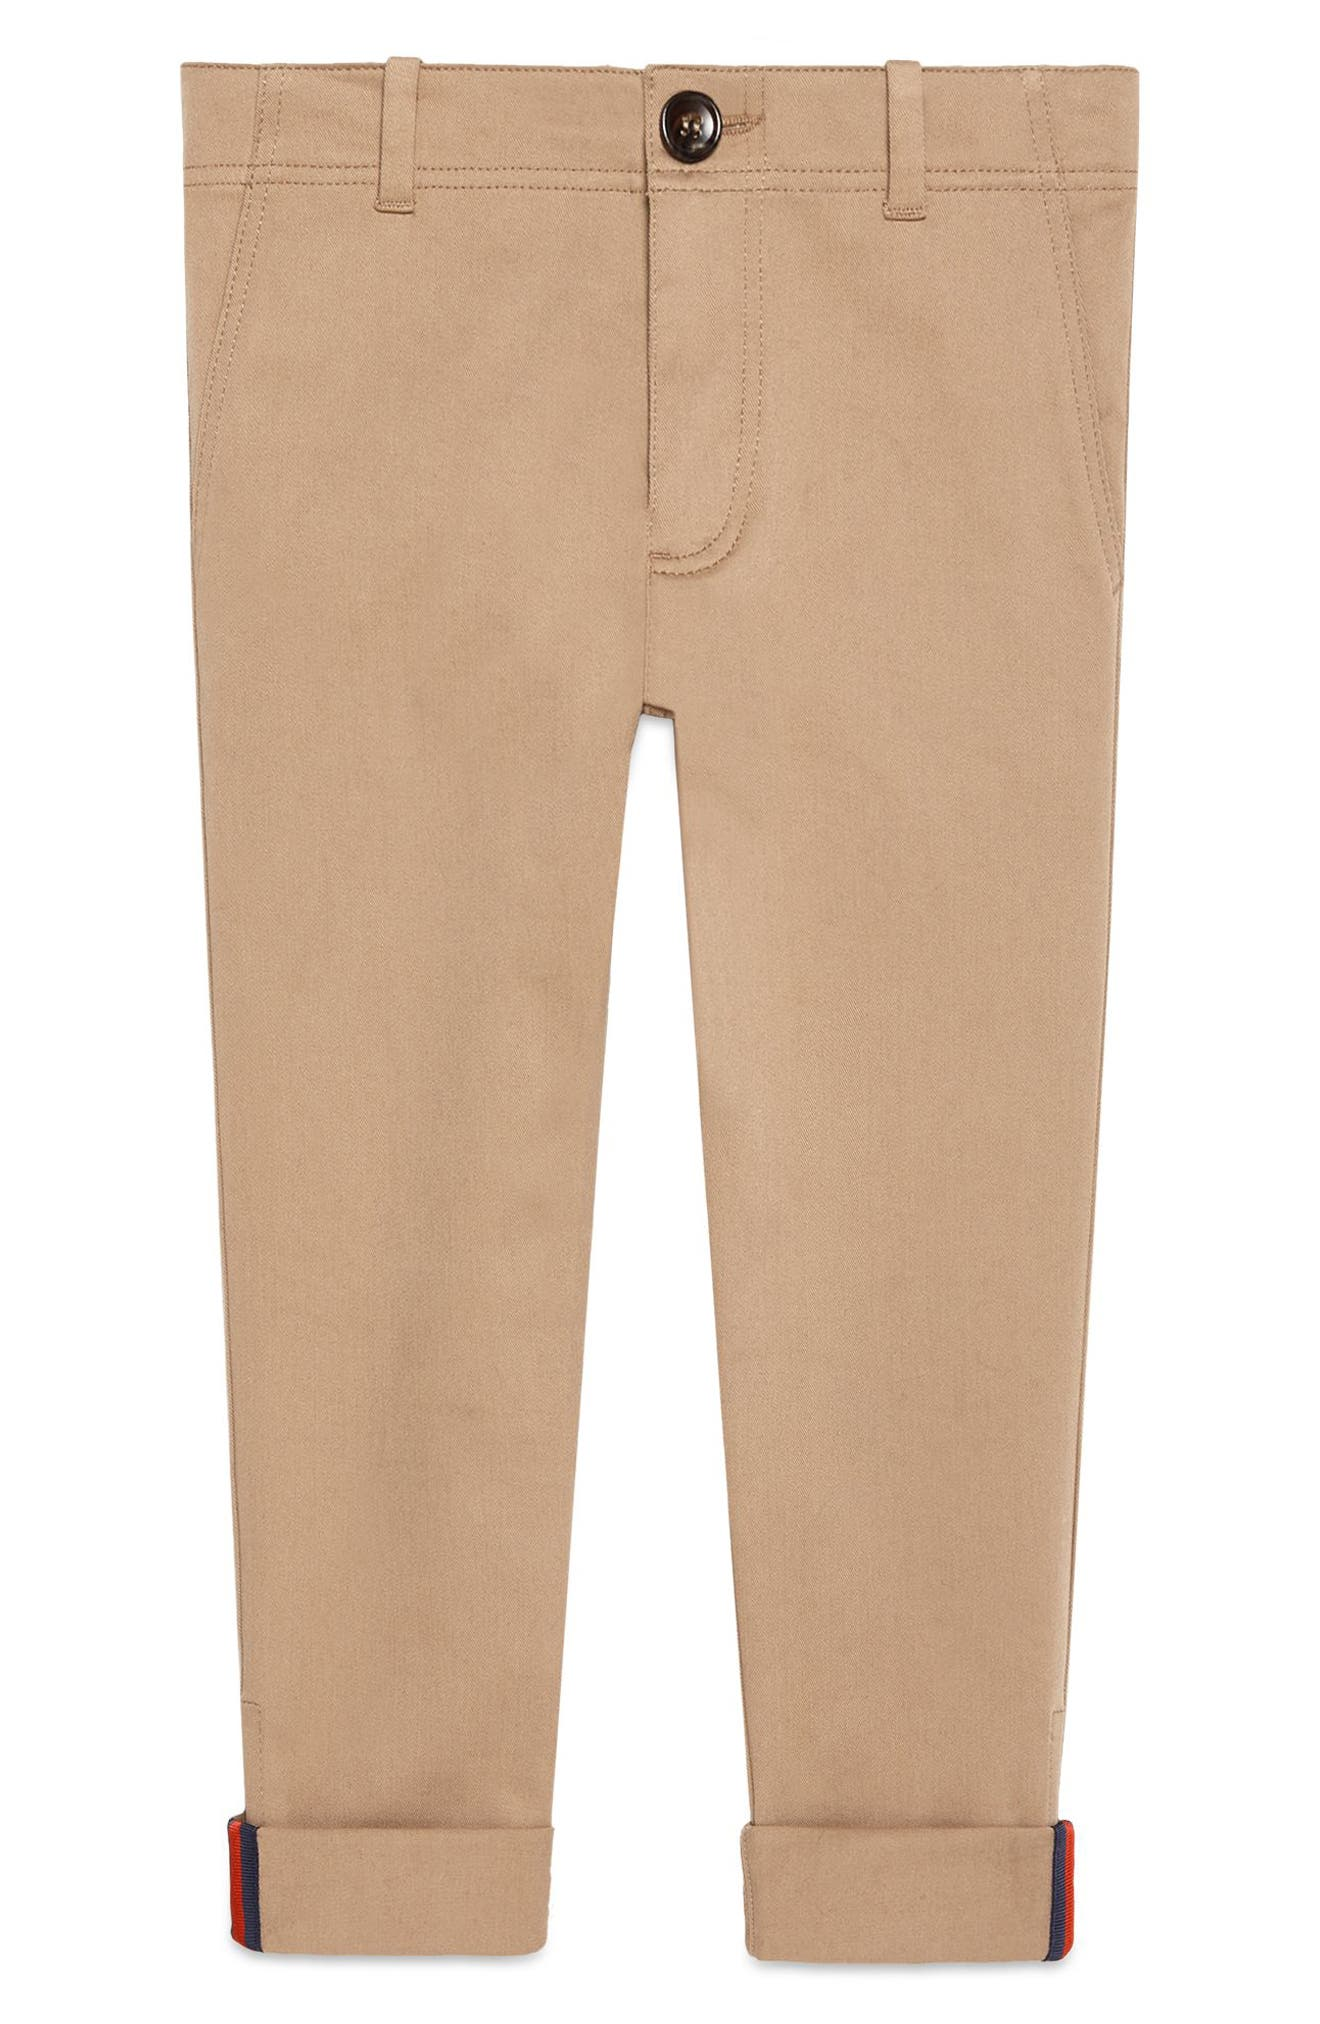 Urban Stripe Pants,                             Main thumbnail 1, color,                             Sugarcane/ Blue/ Red